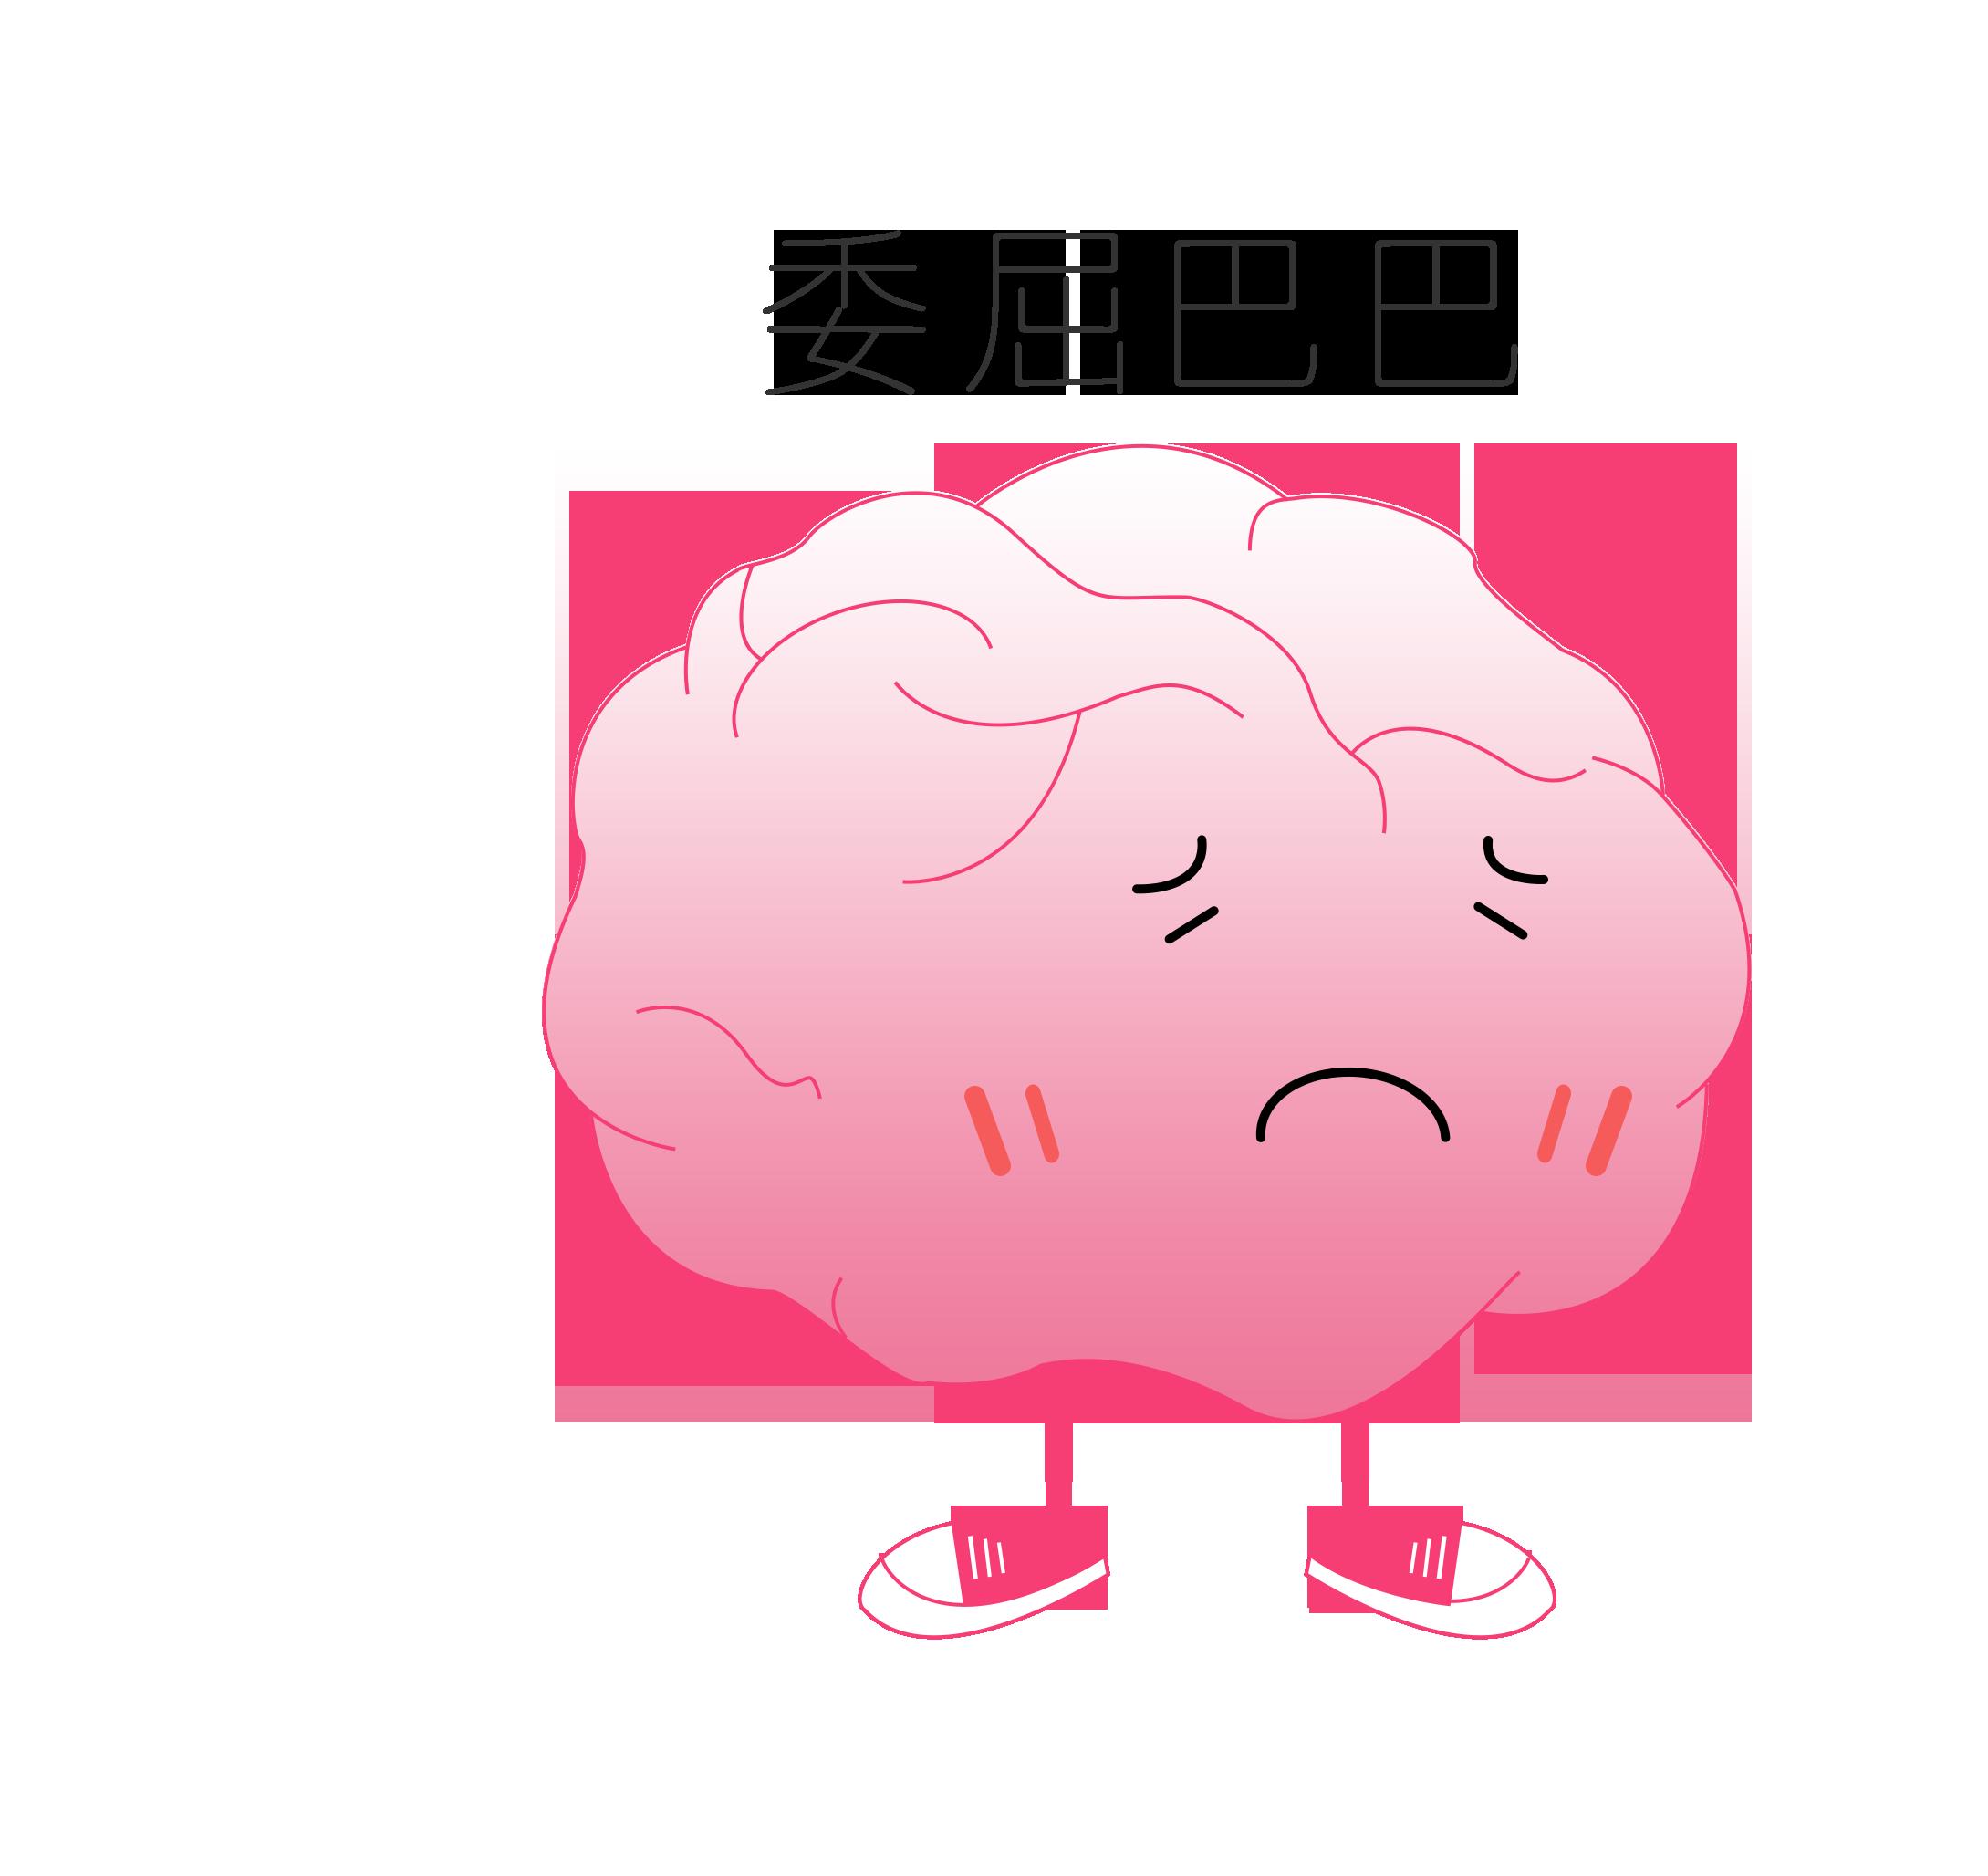 脑洞大师-Emoji样式贼多 messages sticker-11